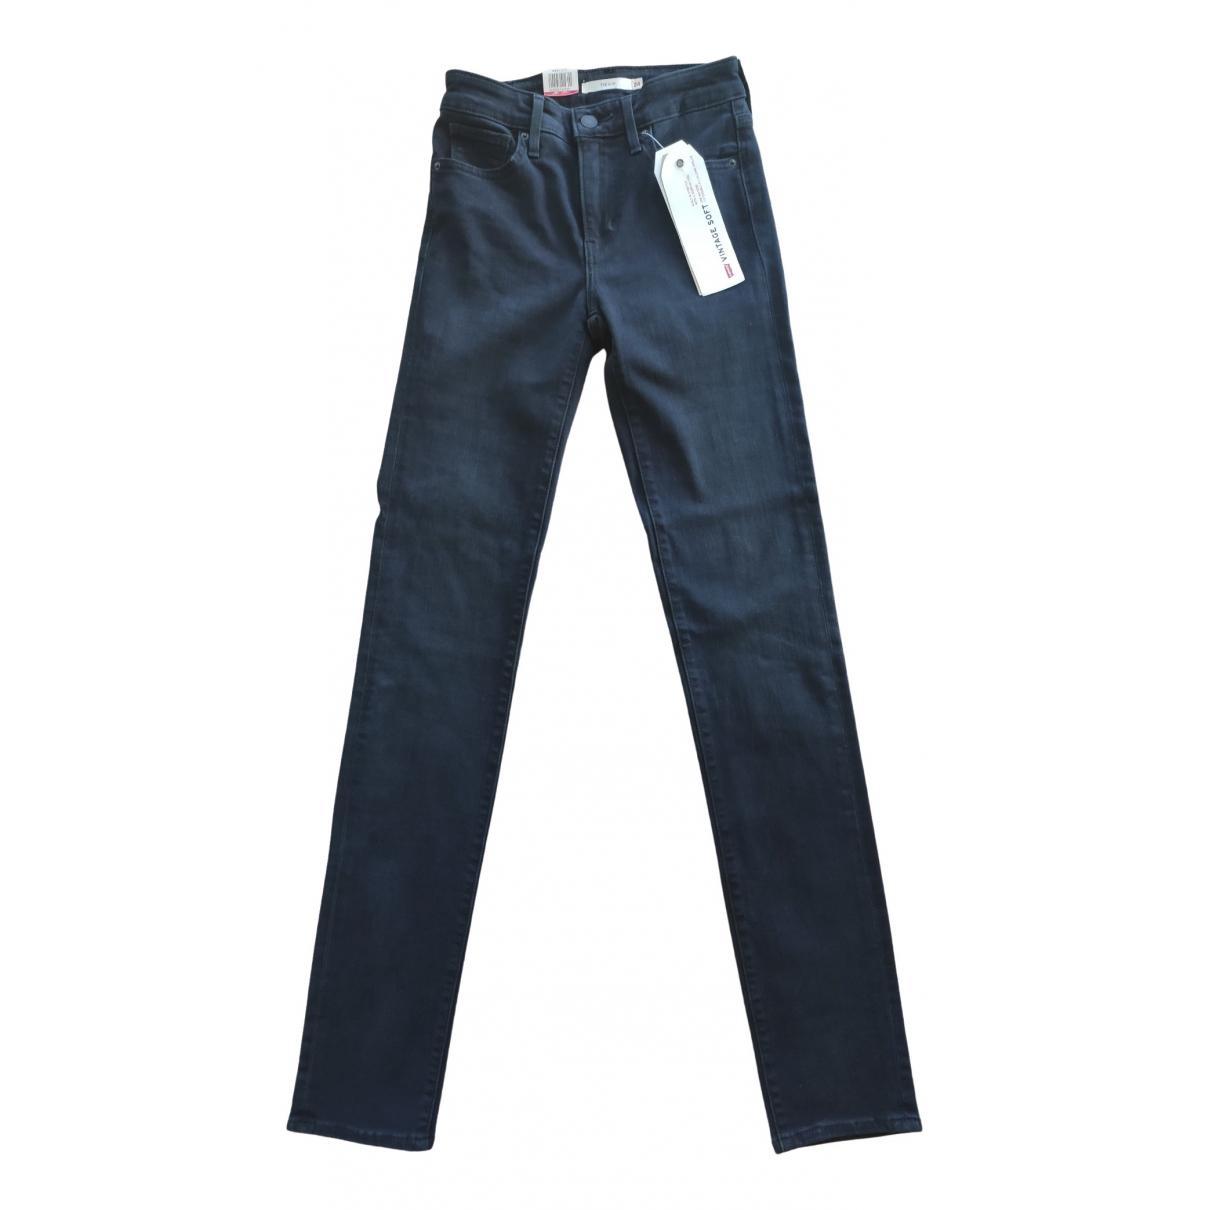 Levi's 712 Black Cotton - elasthane Jeans for Women 24 US